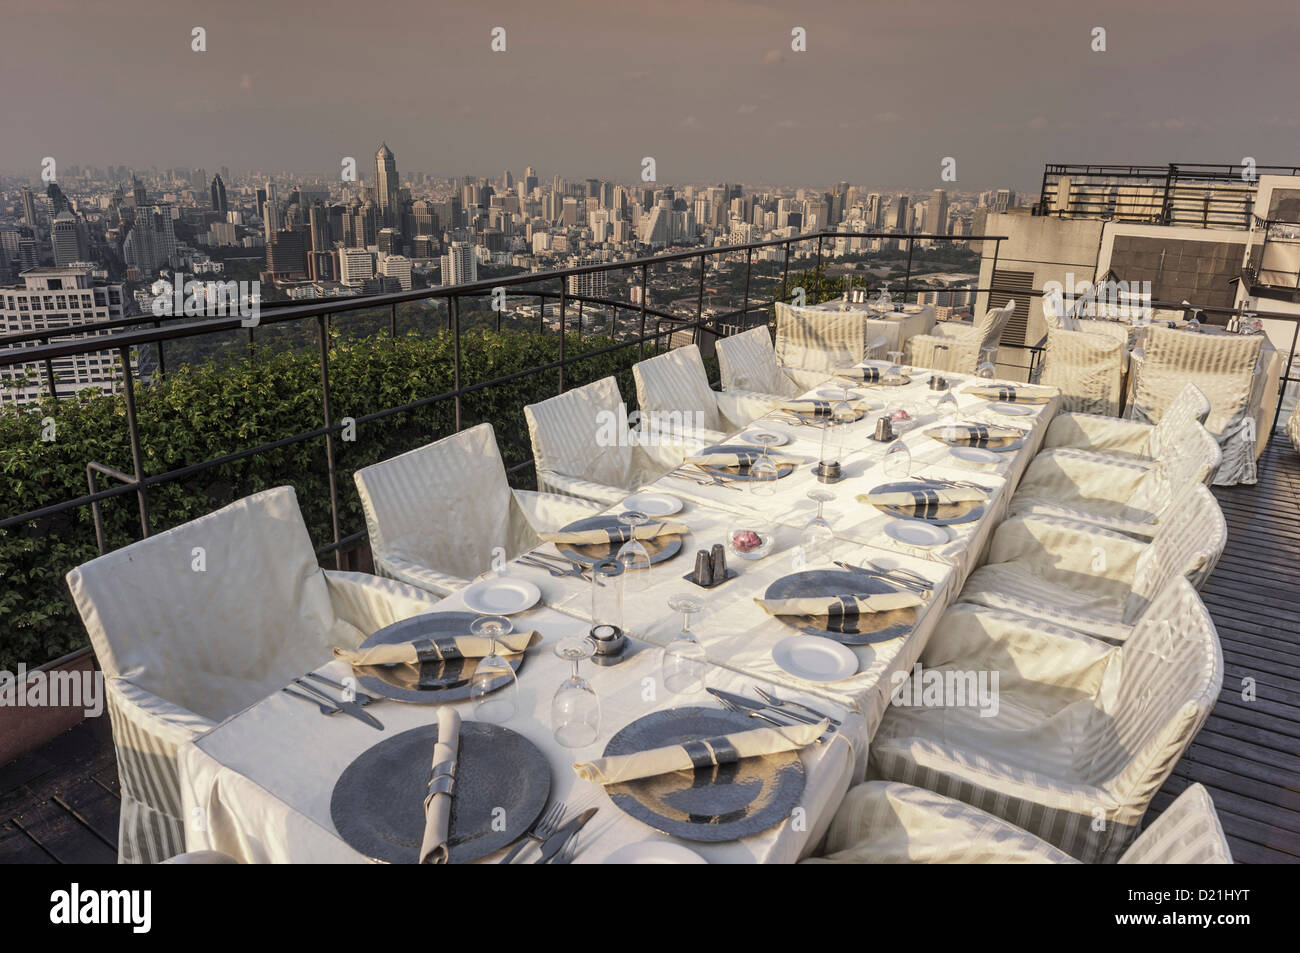 Roof terrace of the Banyan Tree Hotel, Vertigo Bar Restaurant and Moon Bar, Bangkok, Thailand - Stock Image